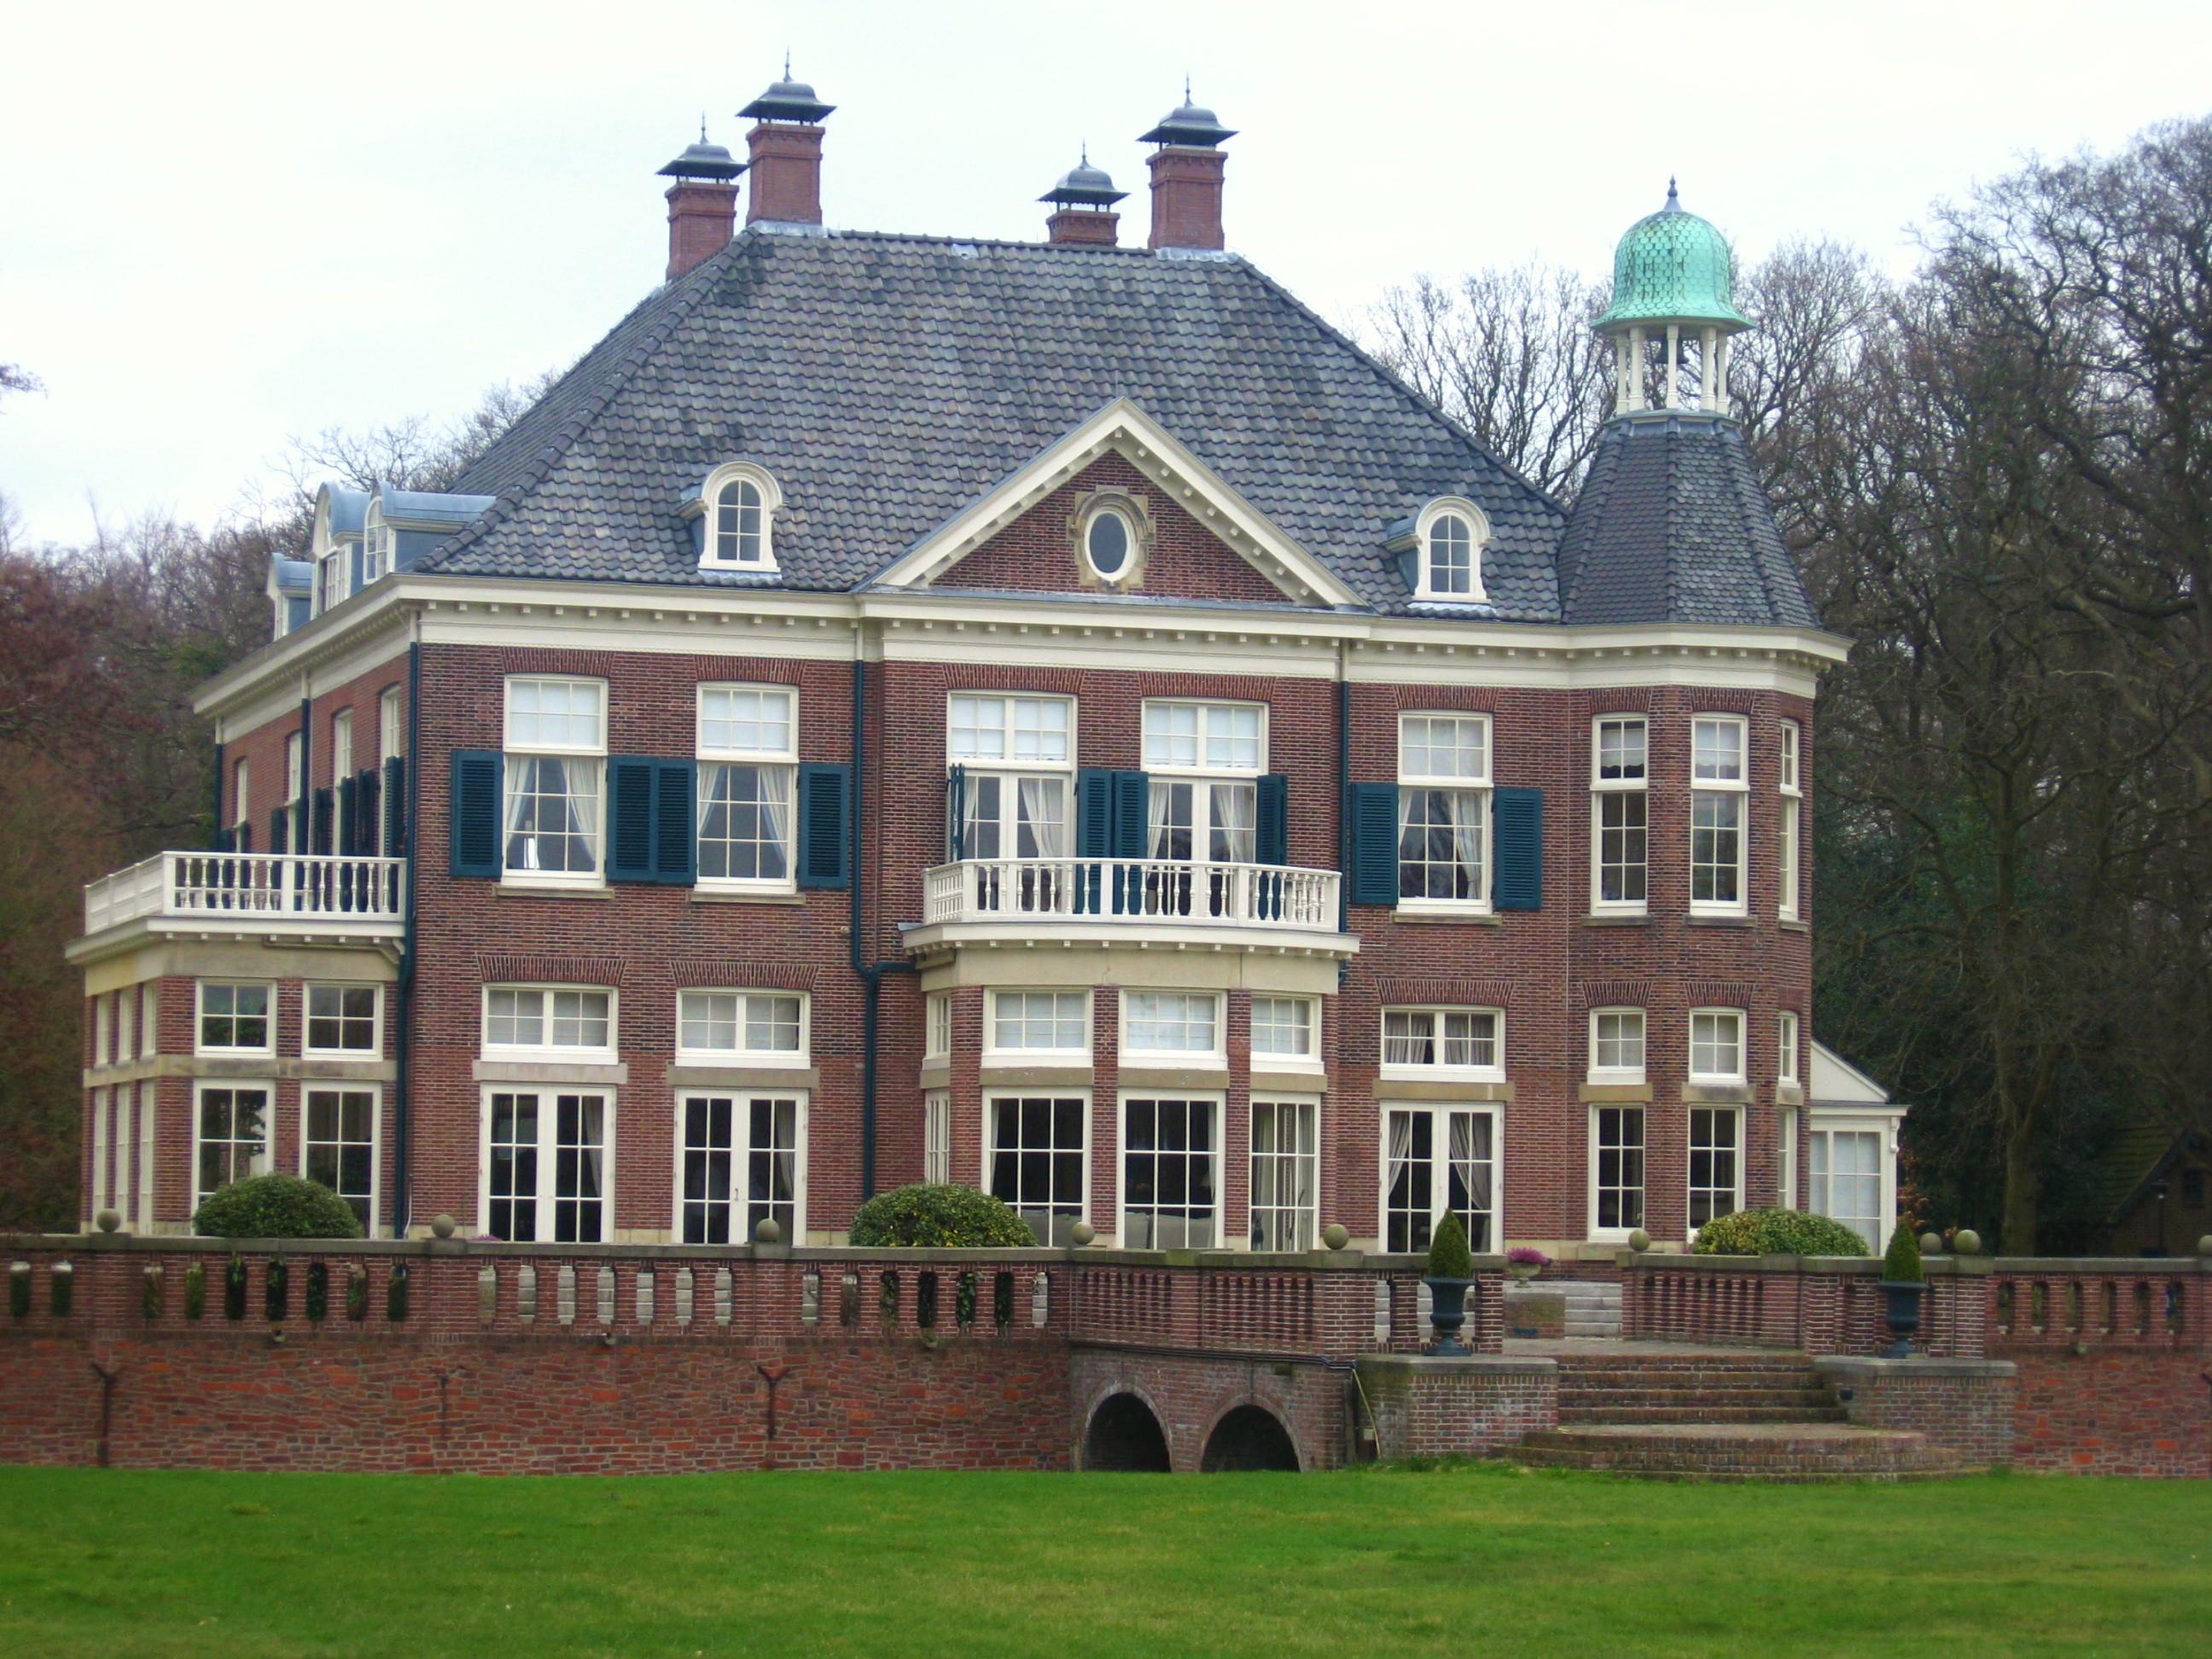 Villa ruys in wassenaar monument - Huis van de cabriolet ...